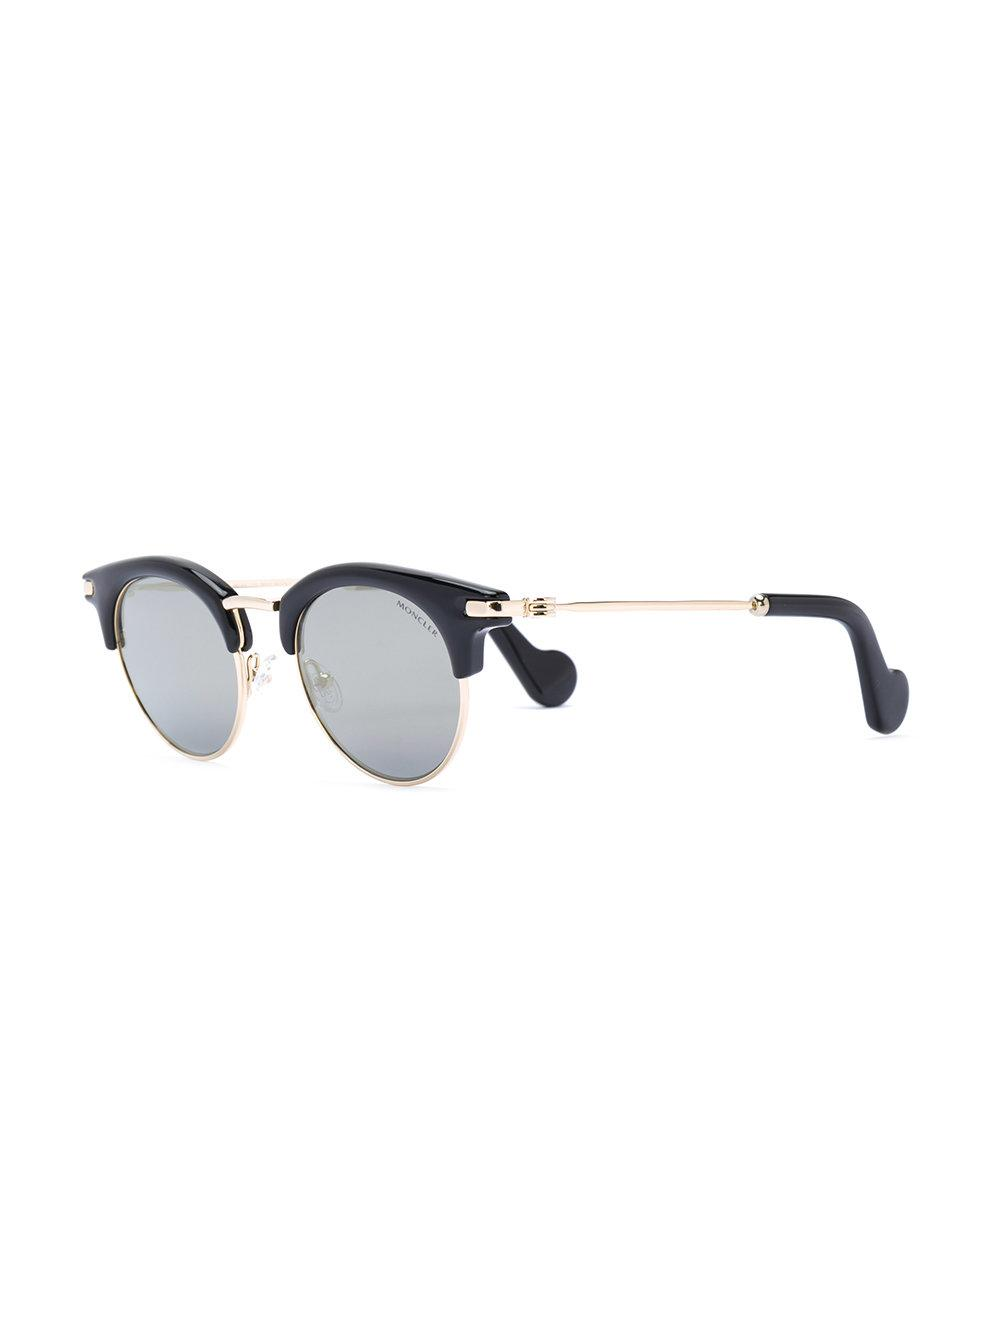 5570b9cfdd Moncler - Black Round Frame Sunglasses - Lyst. View fullscreen